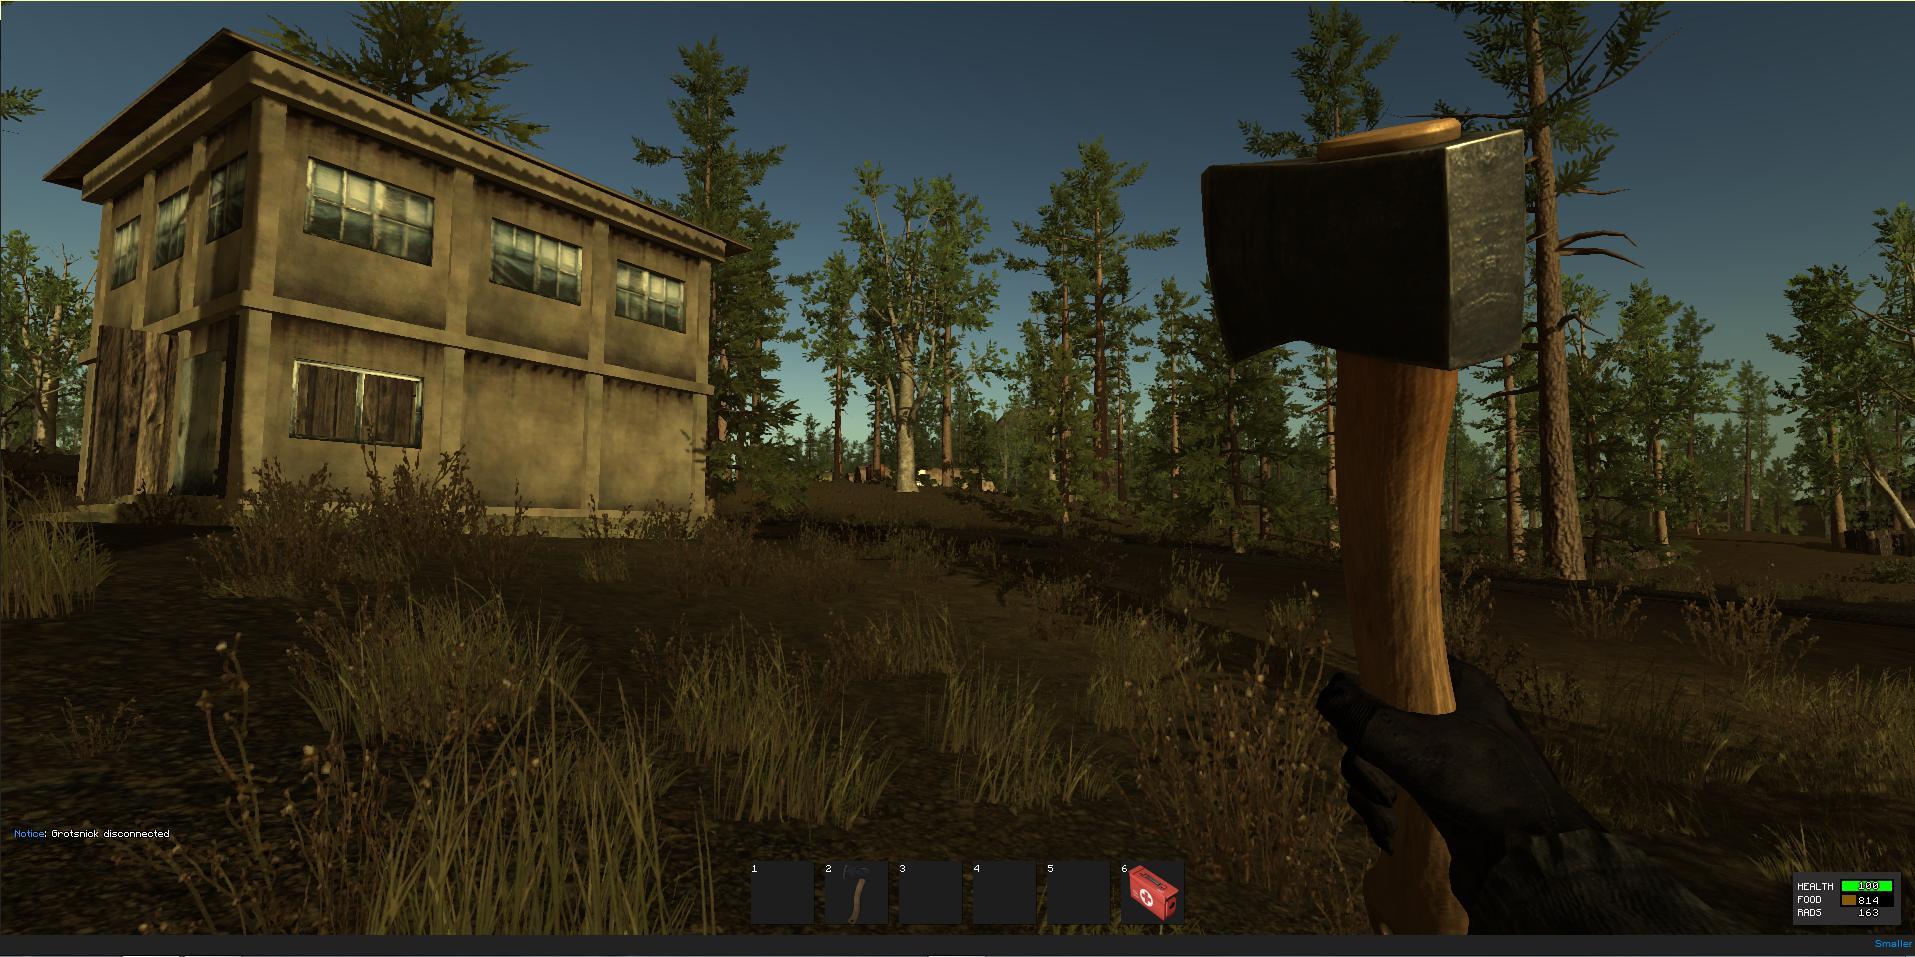 gamepunchers_EP70_rust_wallpaper_header.jpg